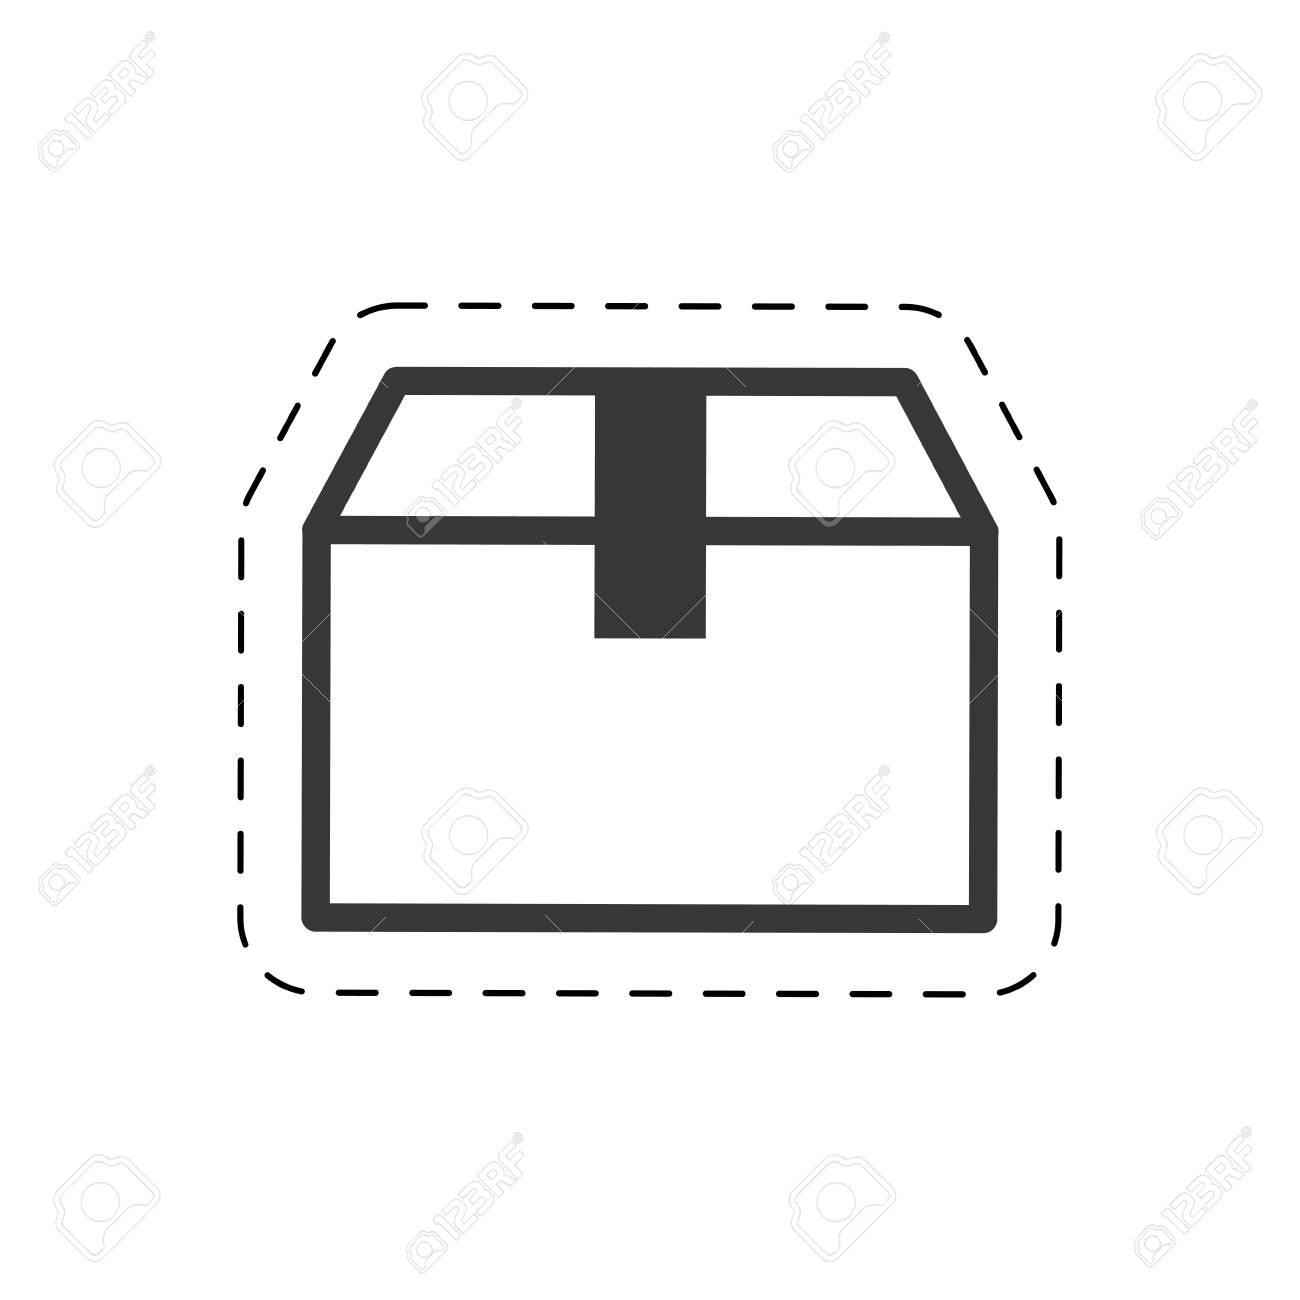 Pedir en línea Dibujo Técnico Regalos | Spreadshirt